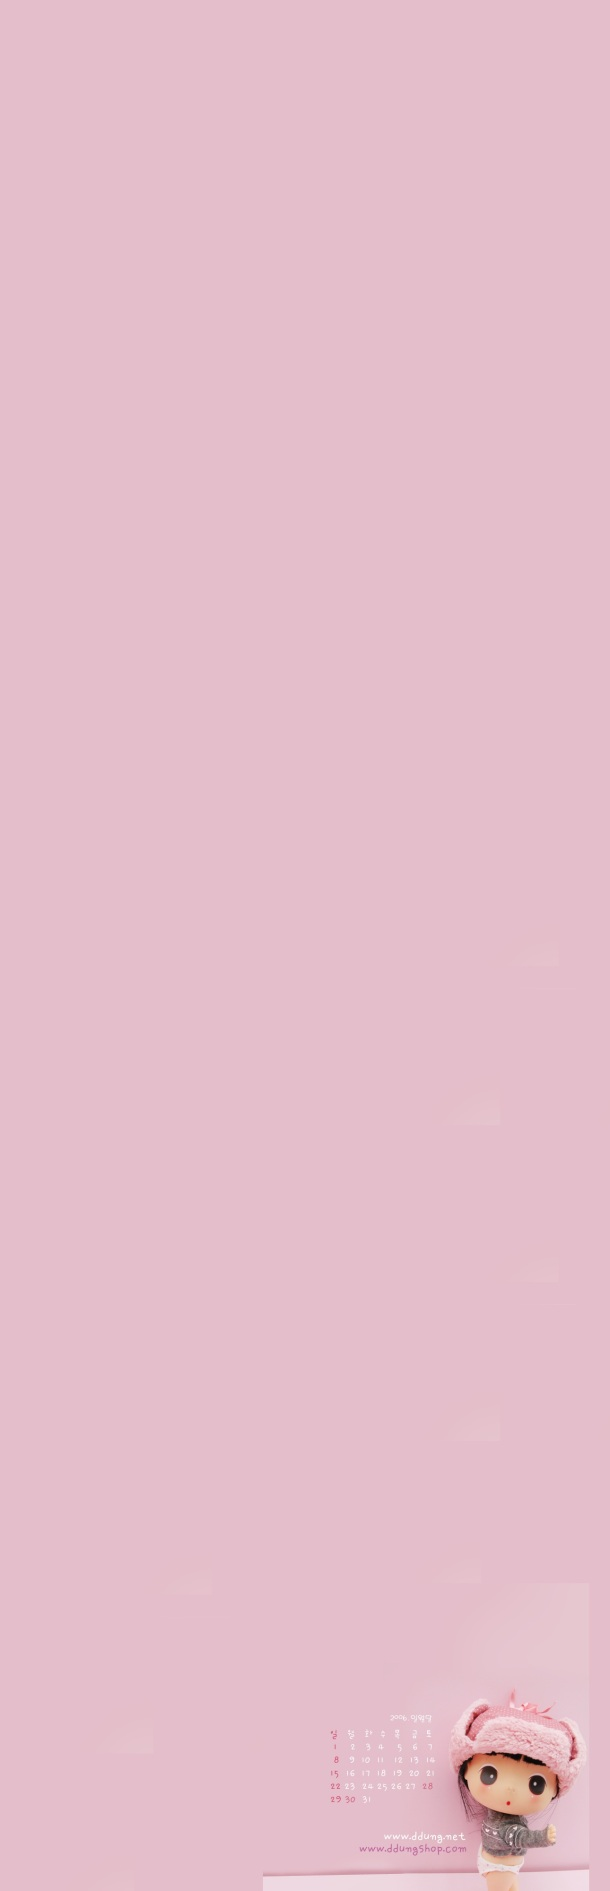 Ddung-Cute-Pink-Hat-1-1280x1024